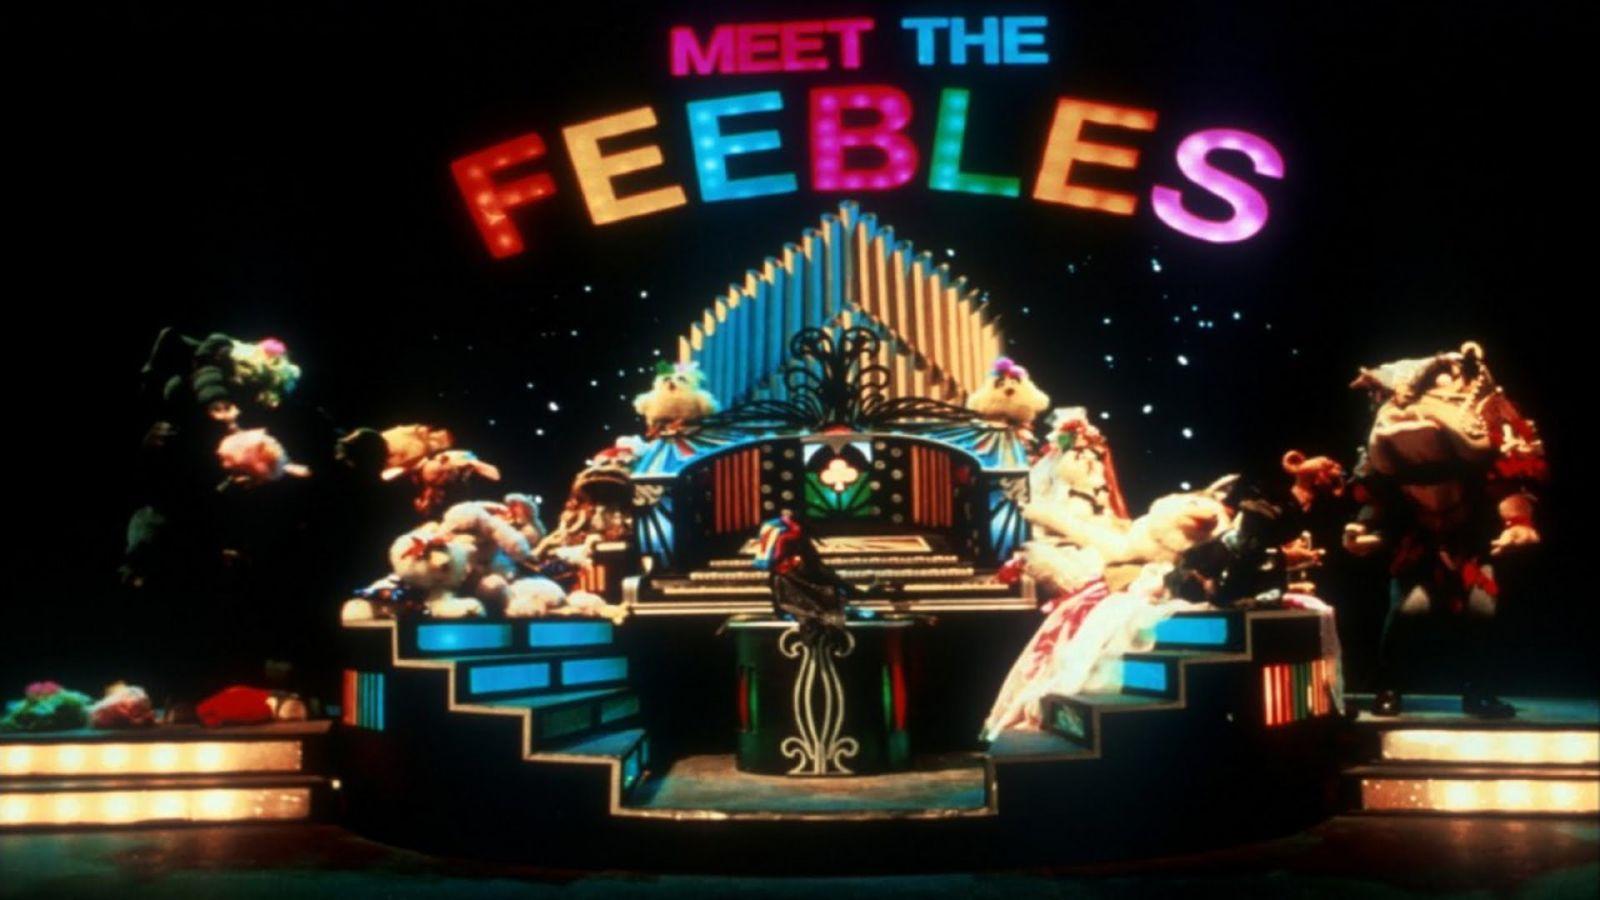 Meet the Feebles (1990)